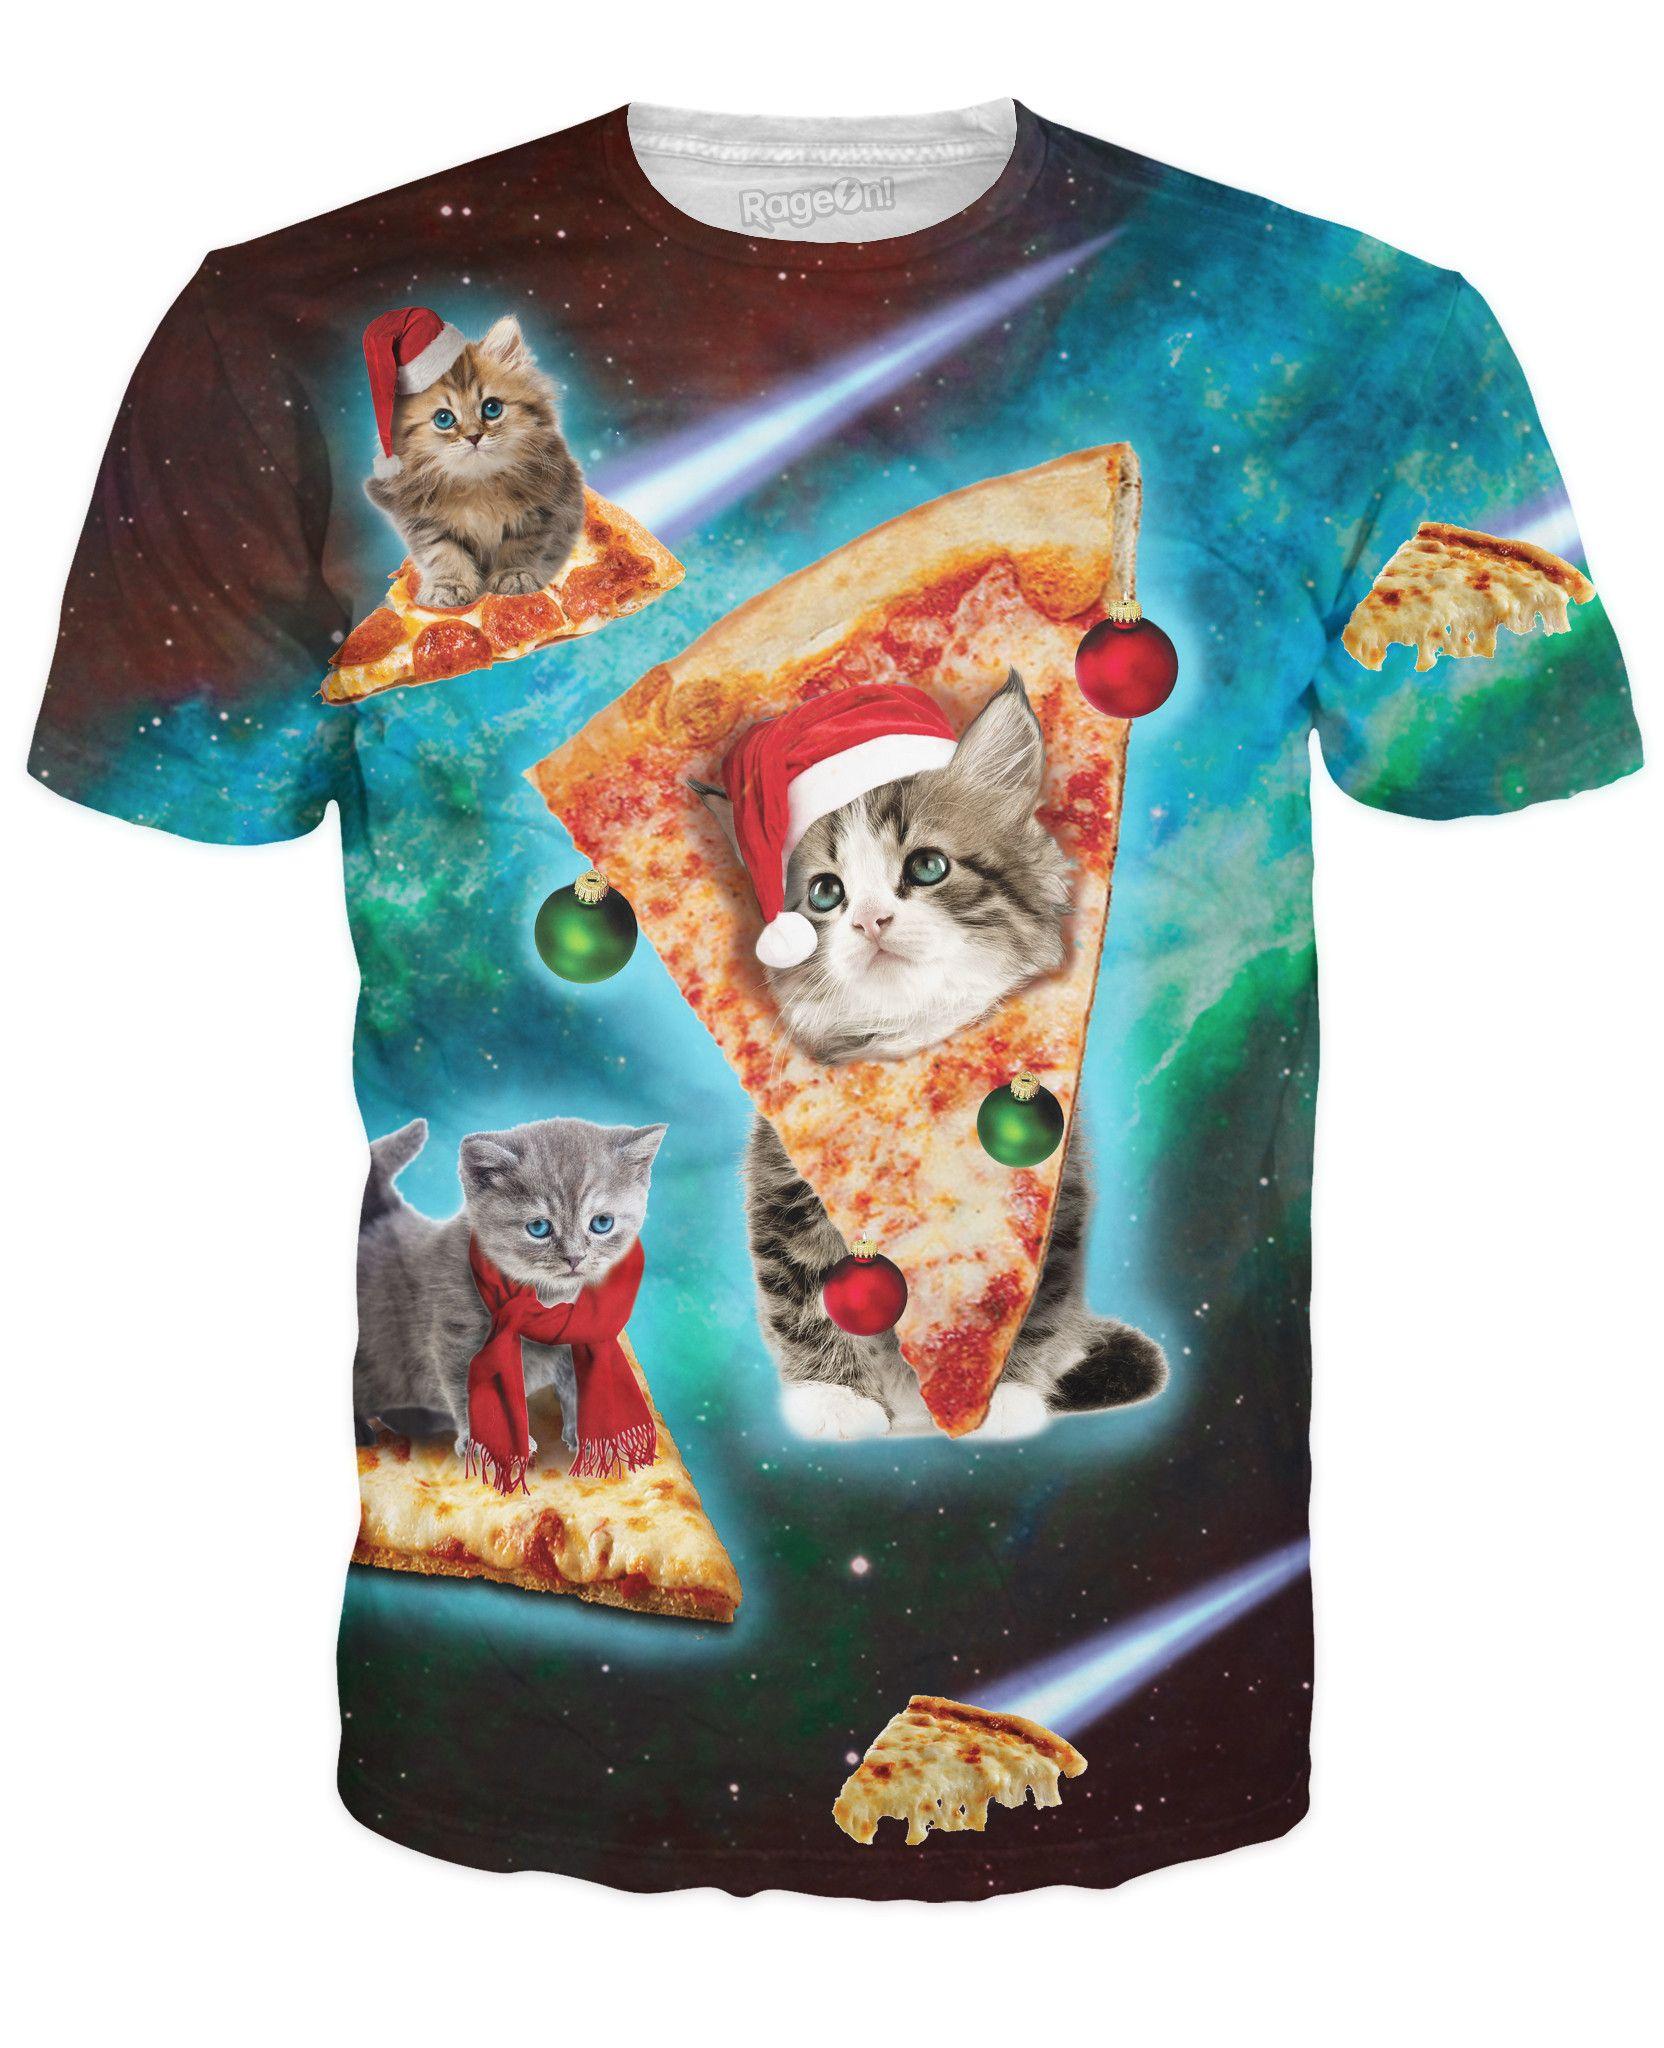 Galaxy Burger Nyan Burrito Cat T Shirt Galaxy Burger Cat Tshirt Cat Tee